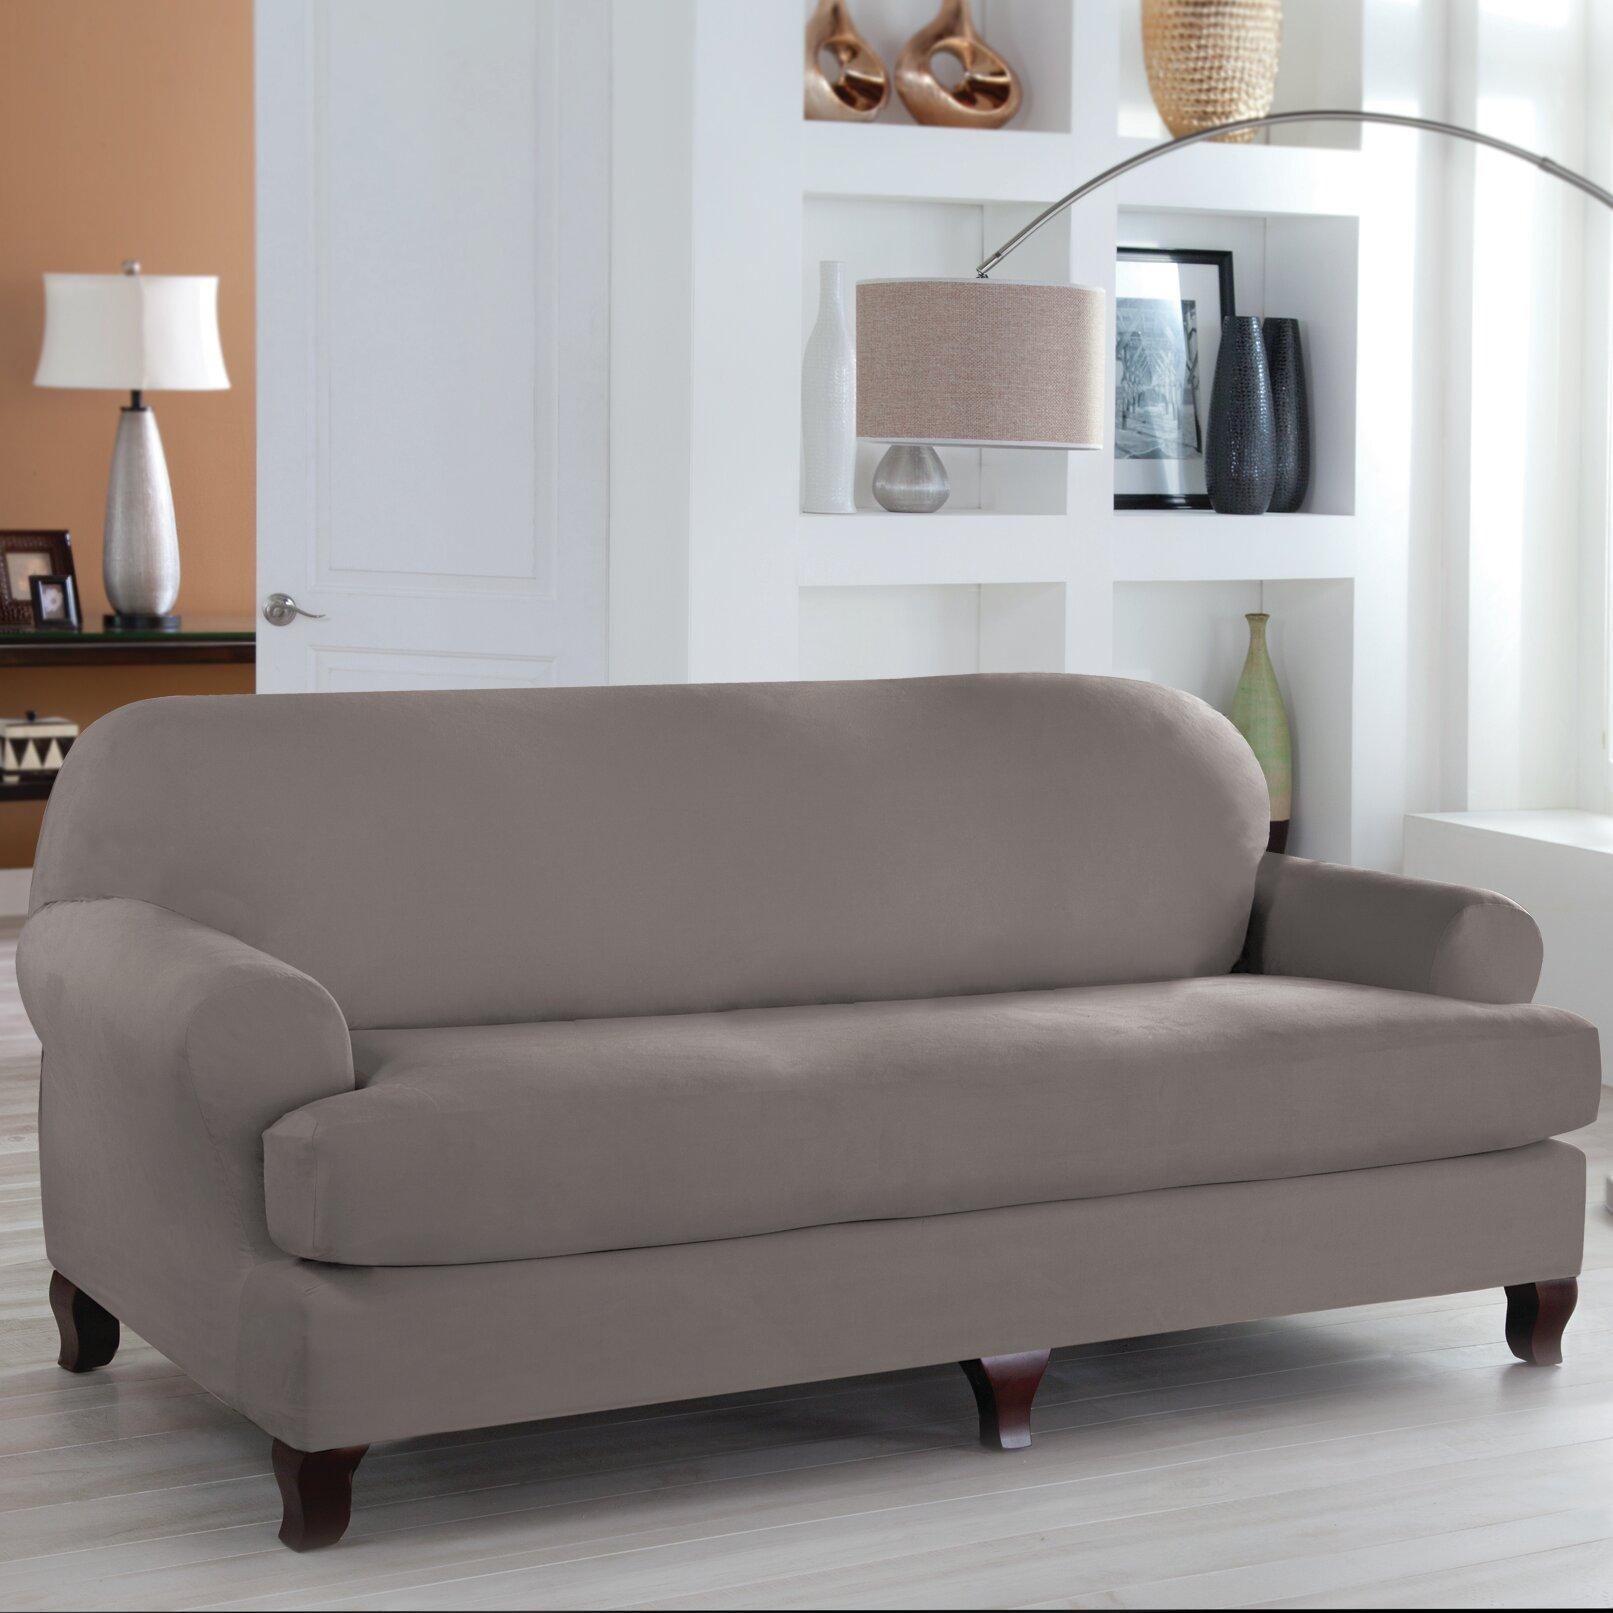 Serta Tailor Fit T-Cushion Sofa Slipcover & Reviews | Wayfair